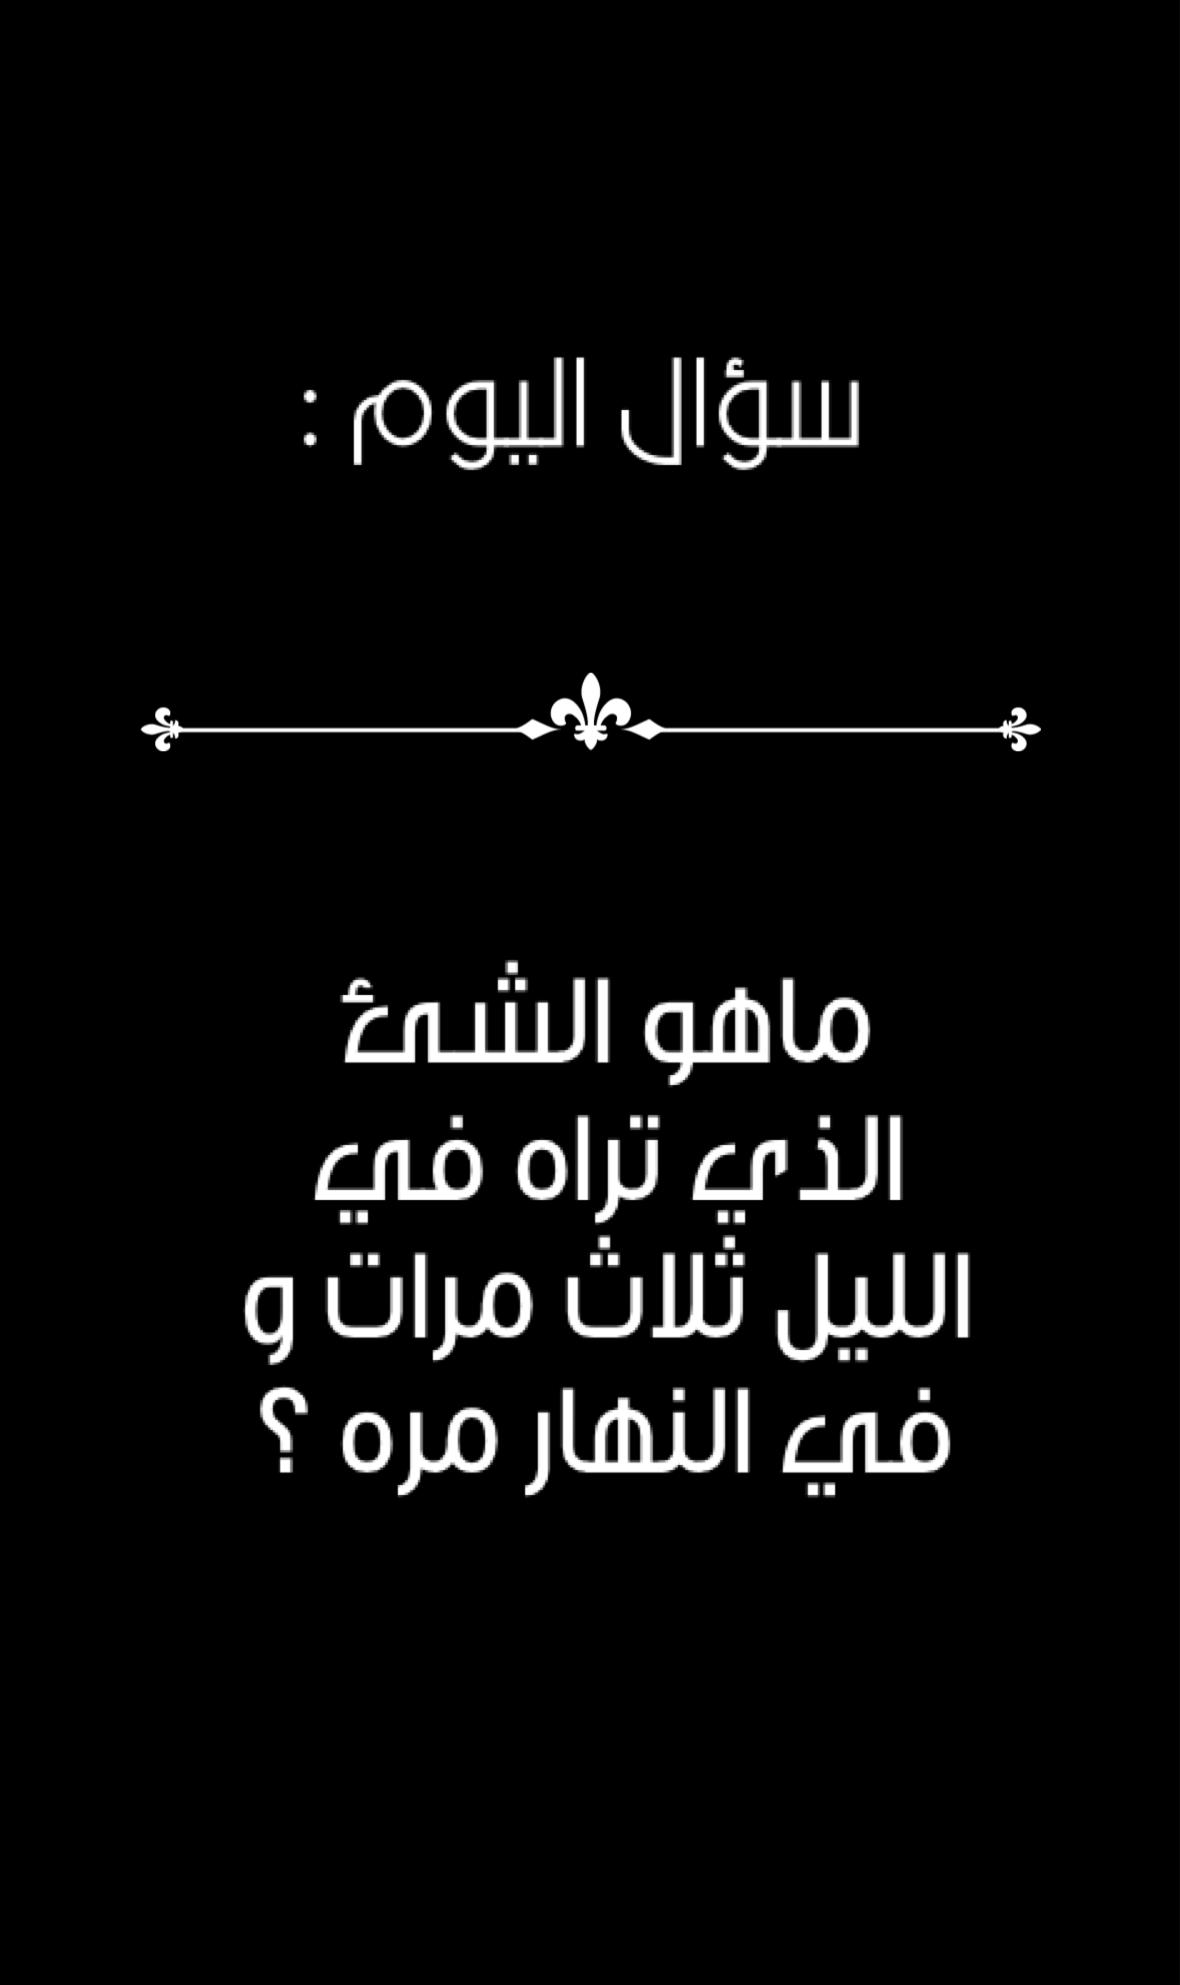 سهل يمديكم عليه Funny Arabic Quotes Love Words Words